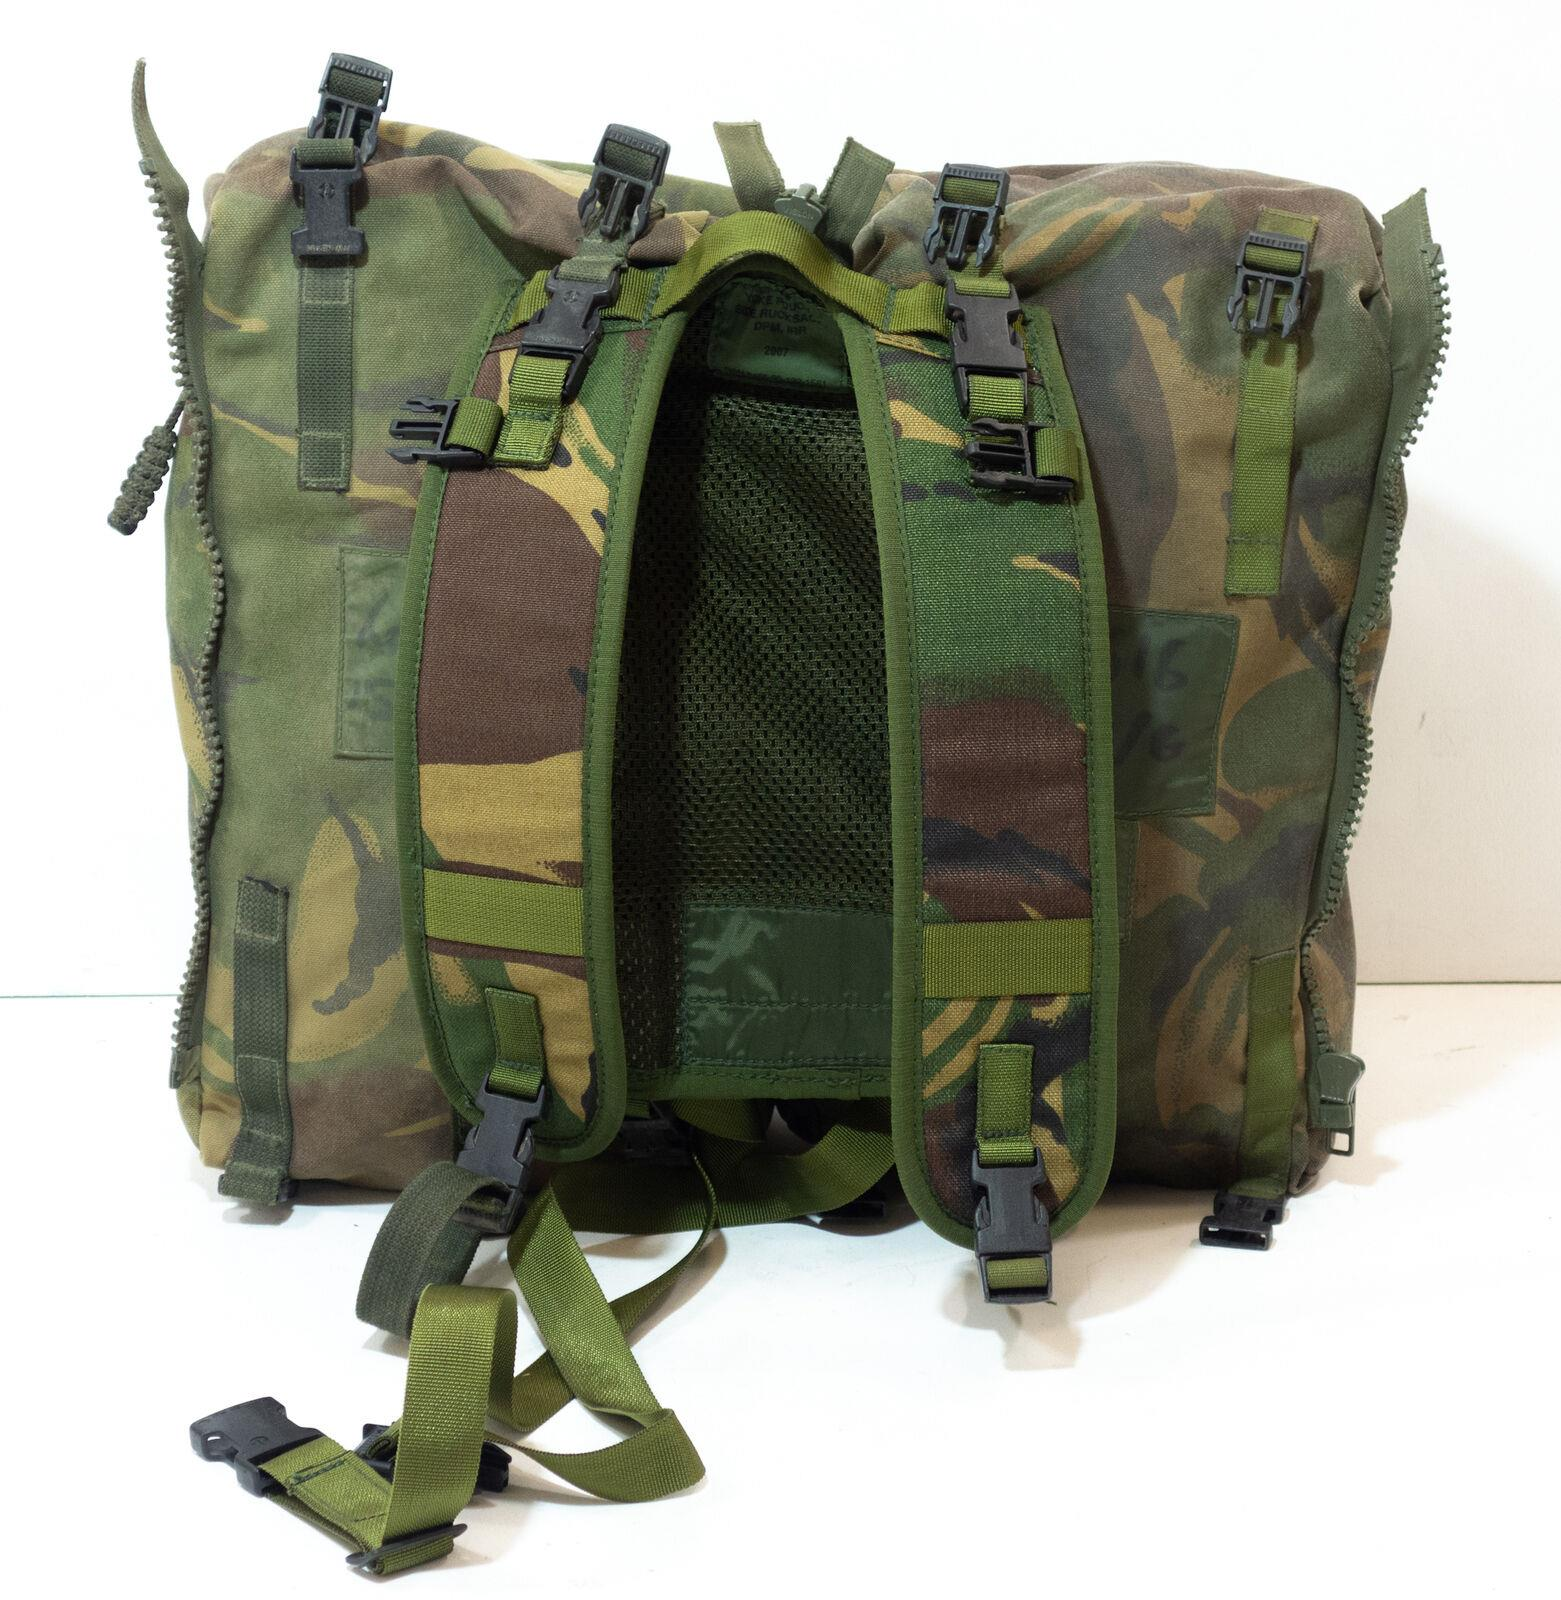 British Army Surplus DPM Camouflage Daysack Yoke